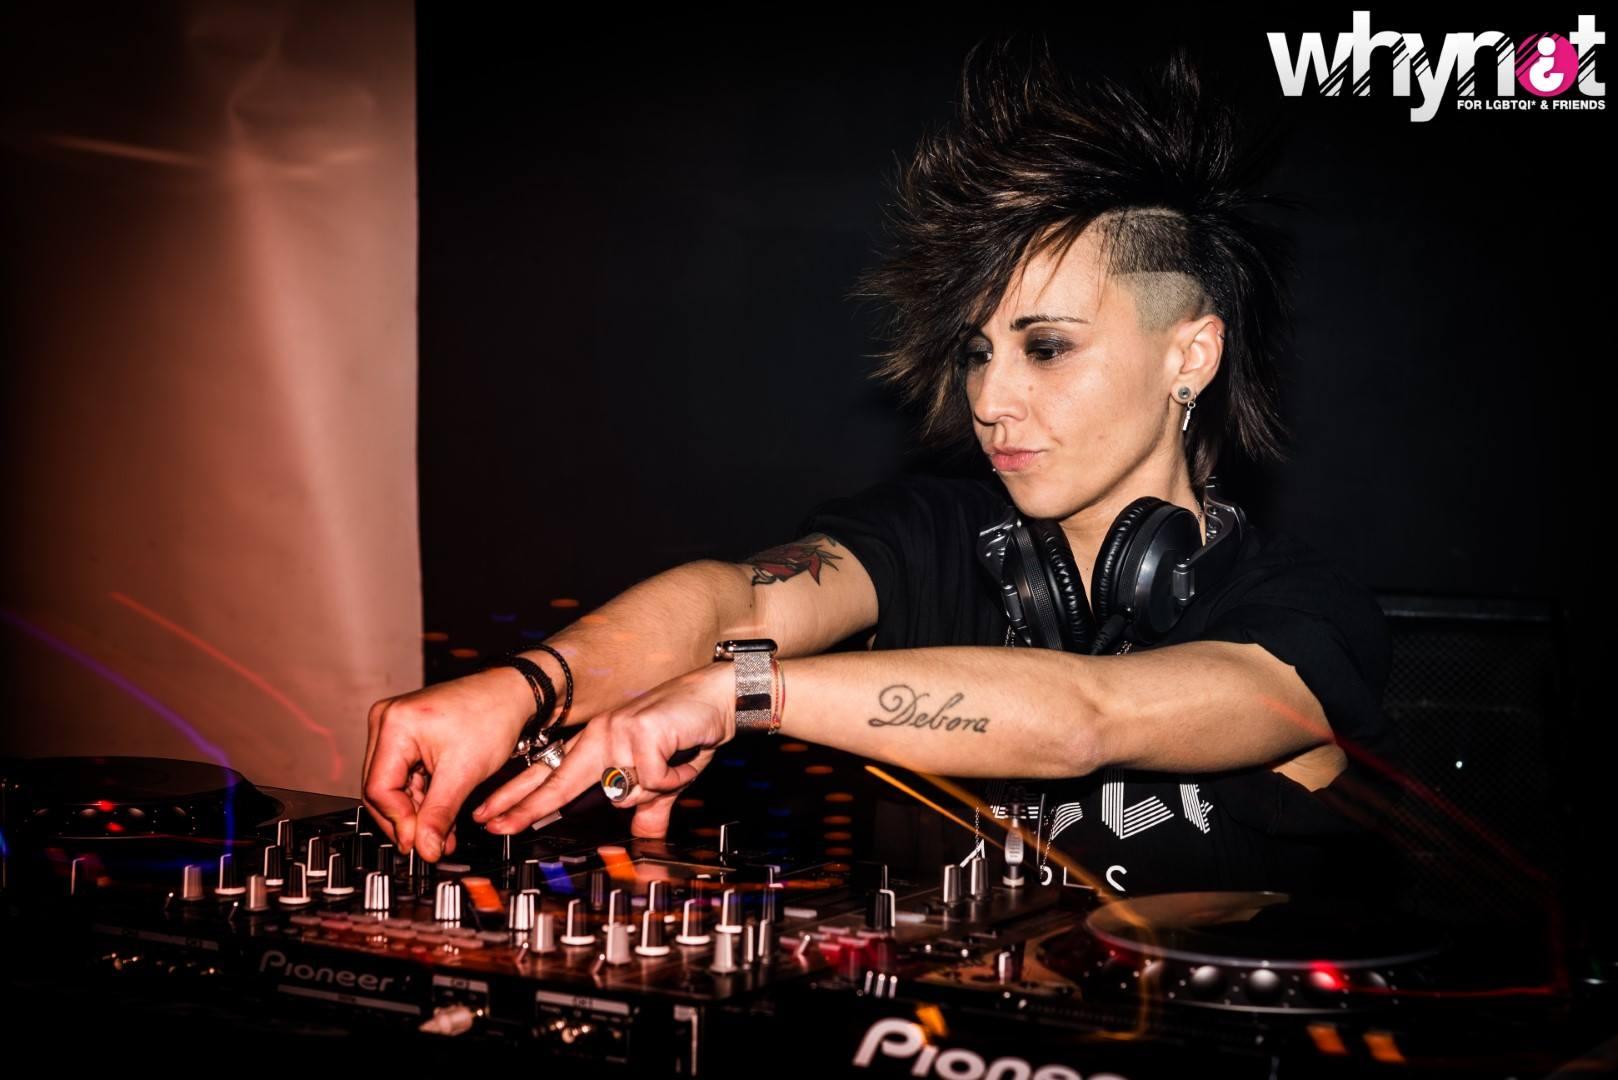 DJ DEBS